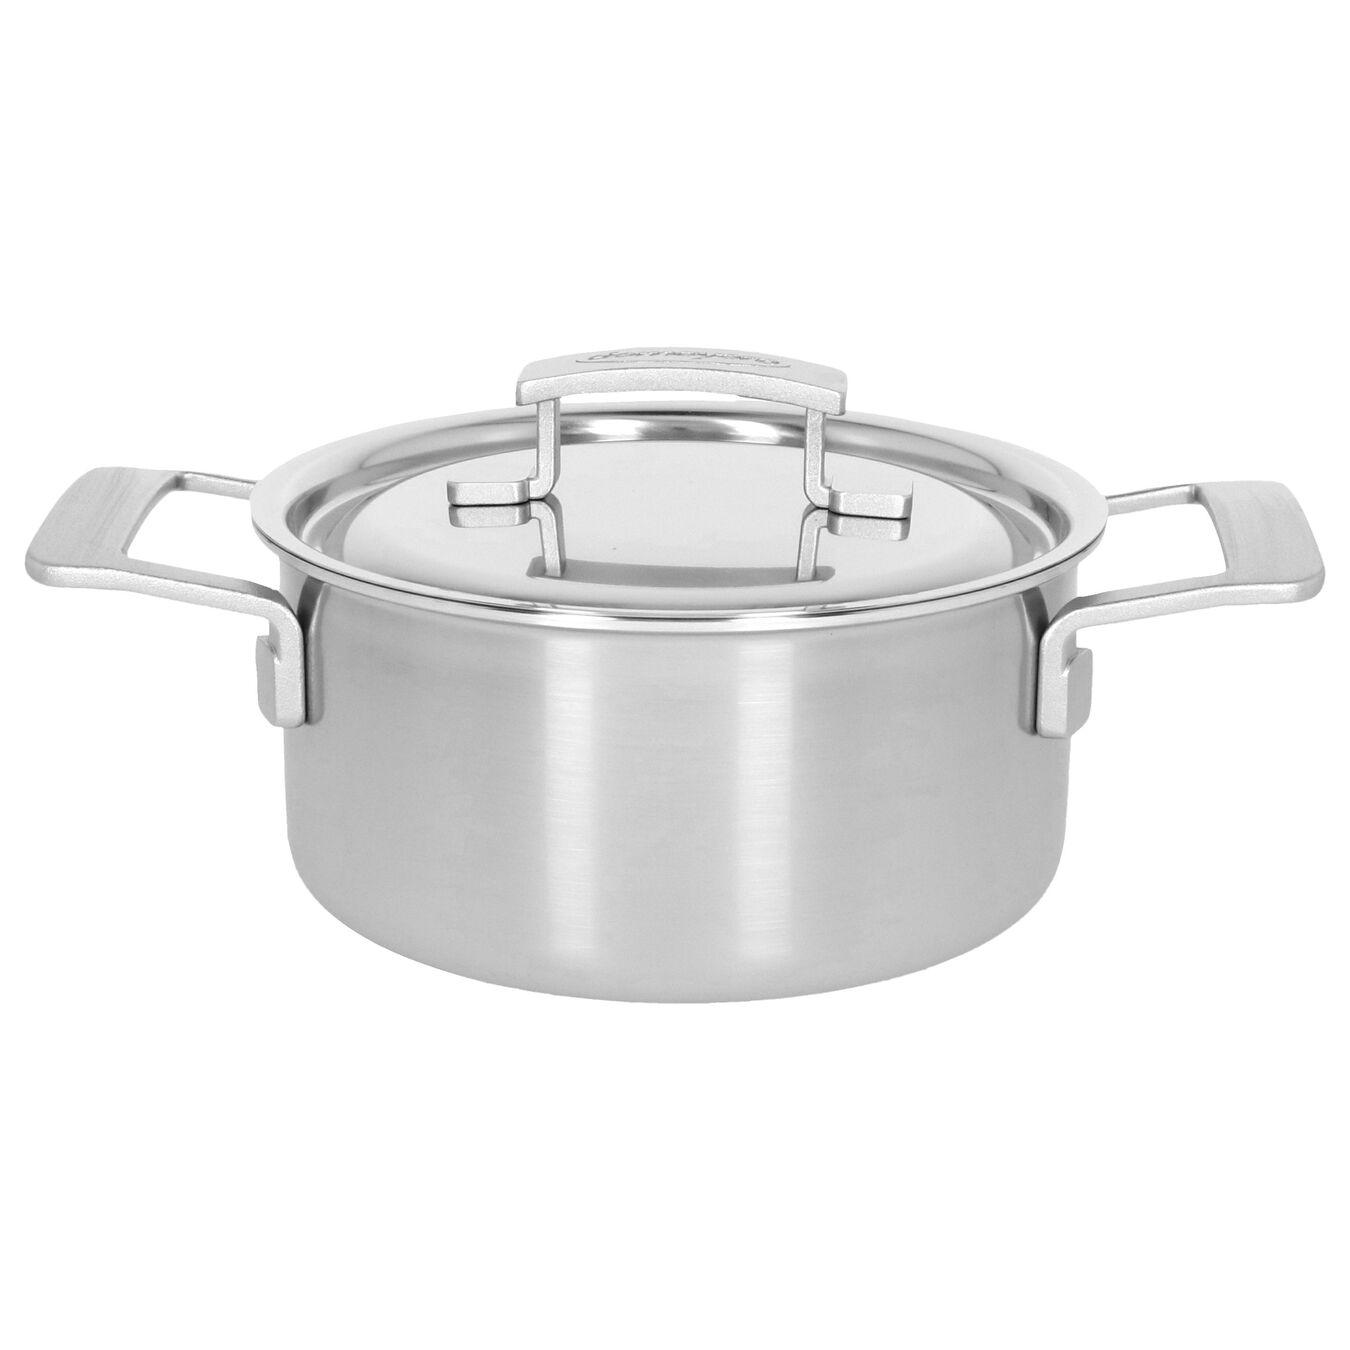 Kookpot met deksel 18 cm / 2,25 l,,large 1